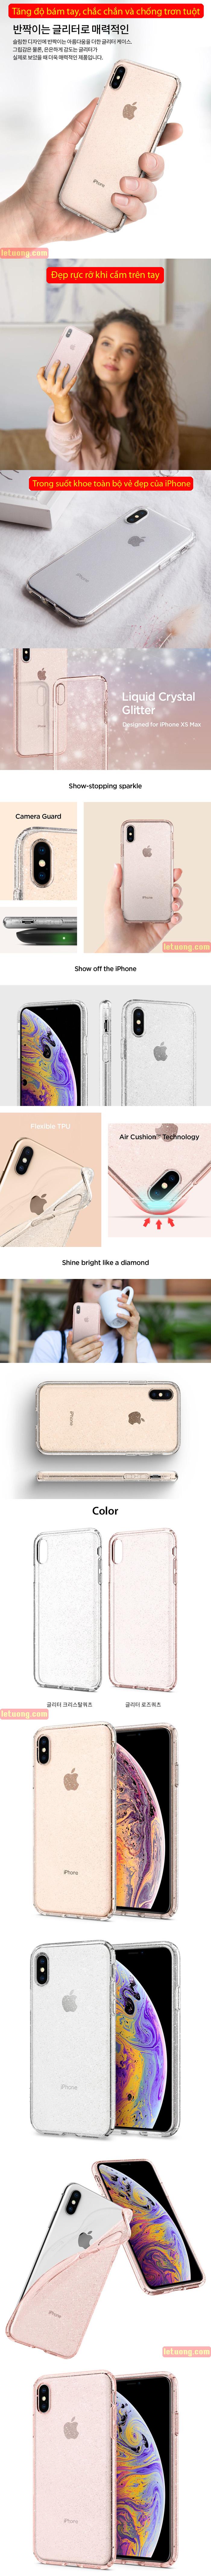 Ốp lưng iPhone Xs Max Spigen Liquid Crystal Glitter kim tuyến ( Hàng USA ) 4